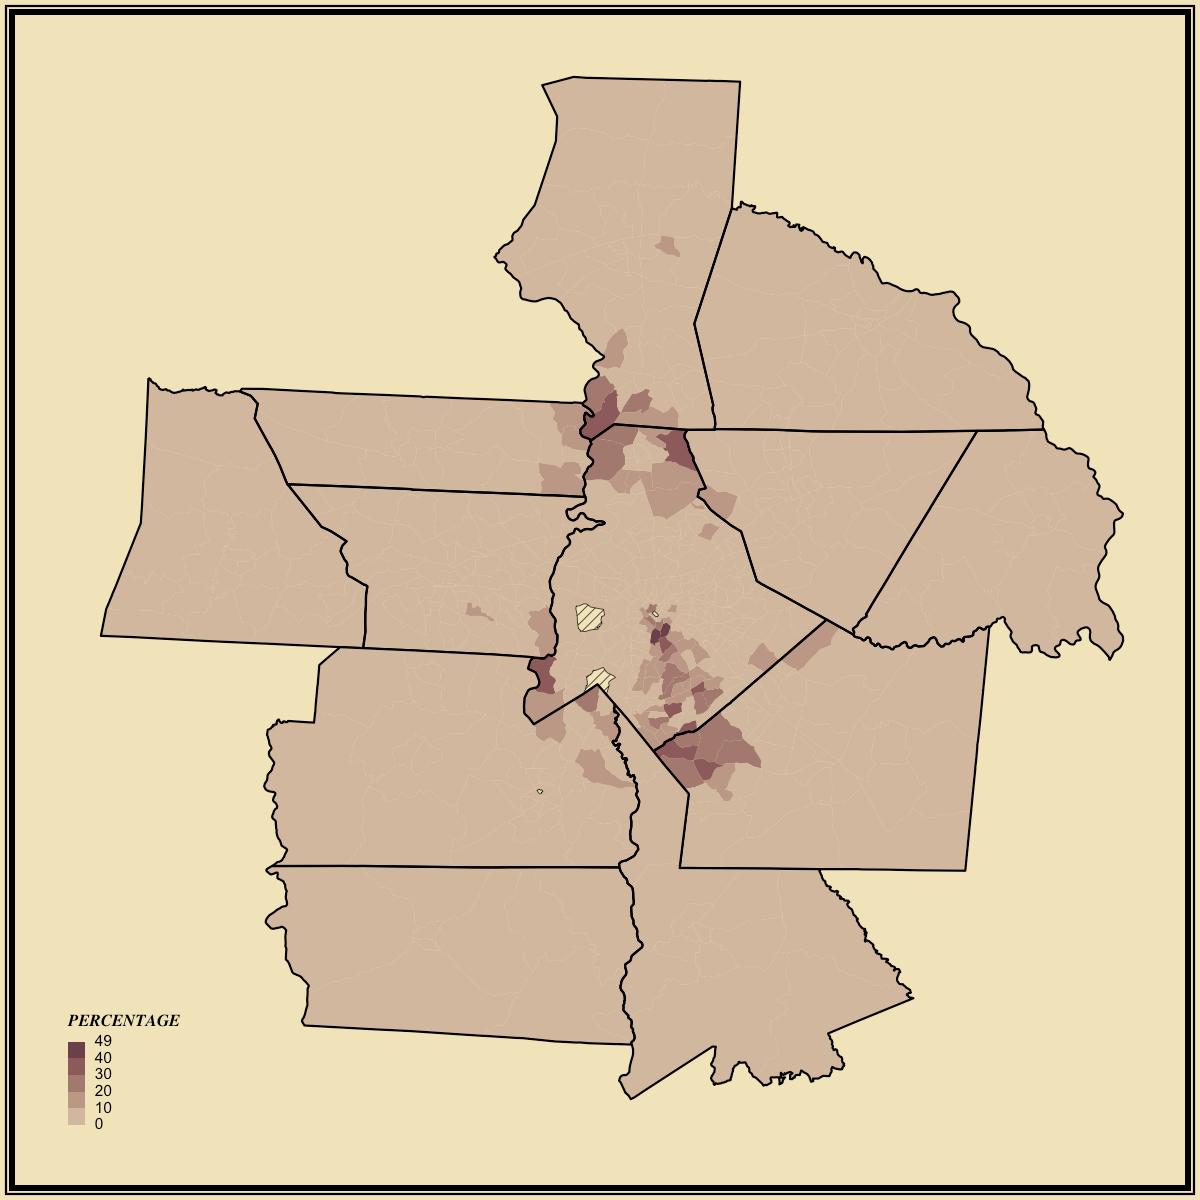 Charlotte Nc Population 2013